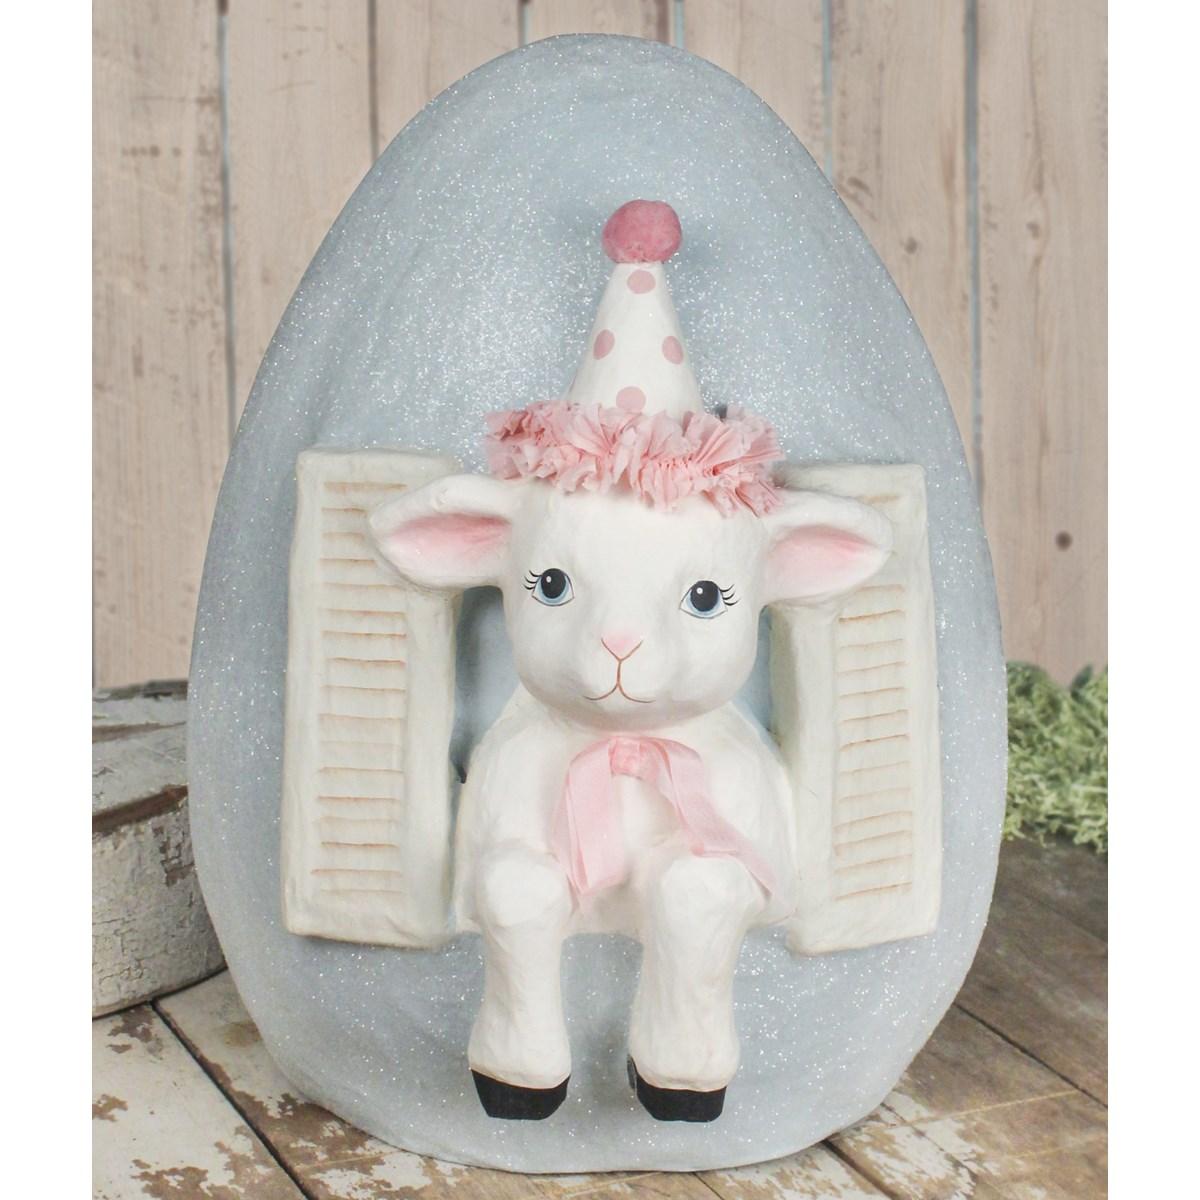 Party Lamb in Egg Paper Mache